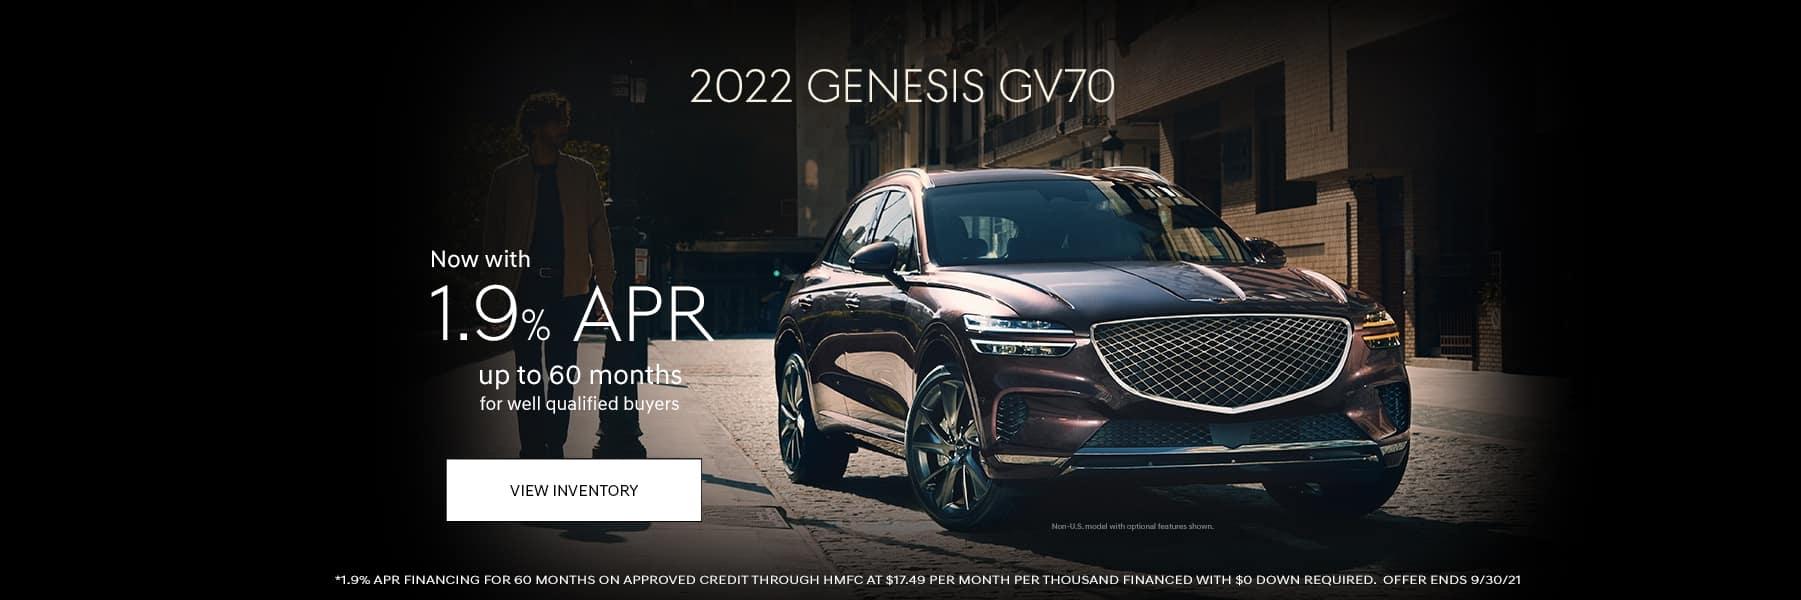 2022-Genesis-GV70-Sep21